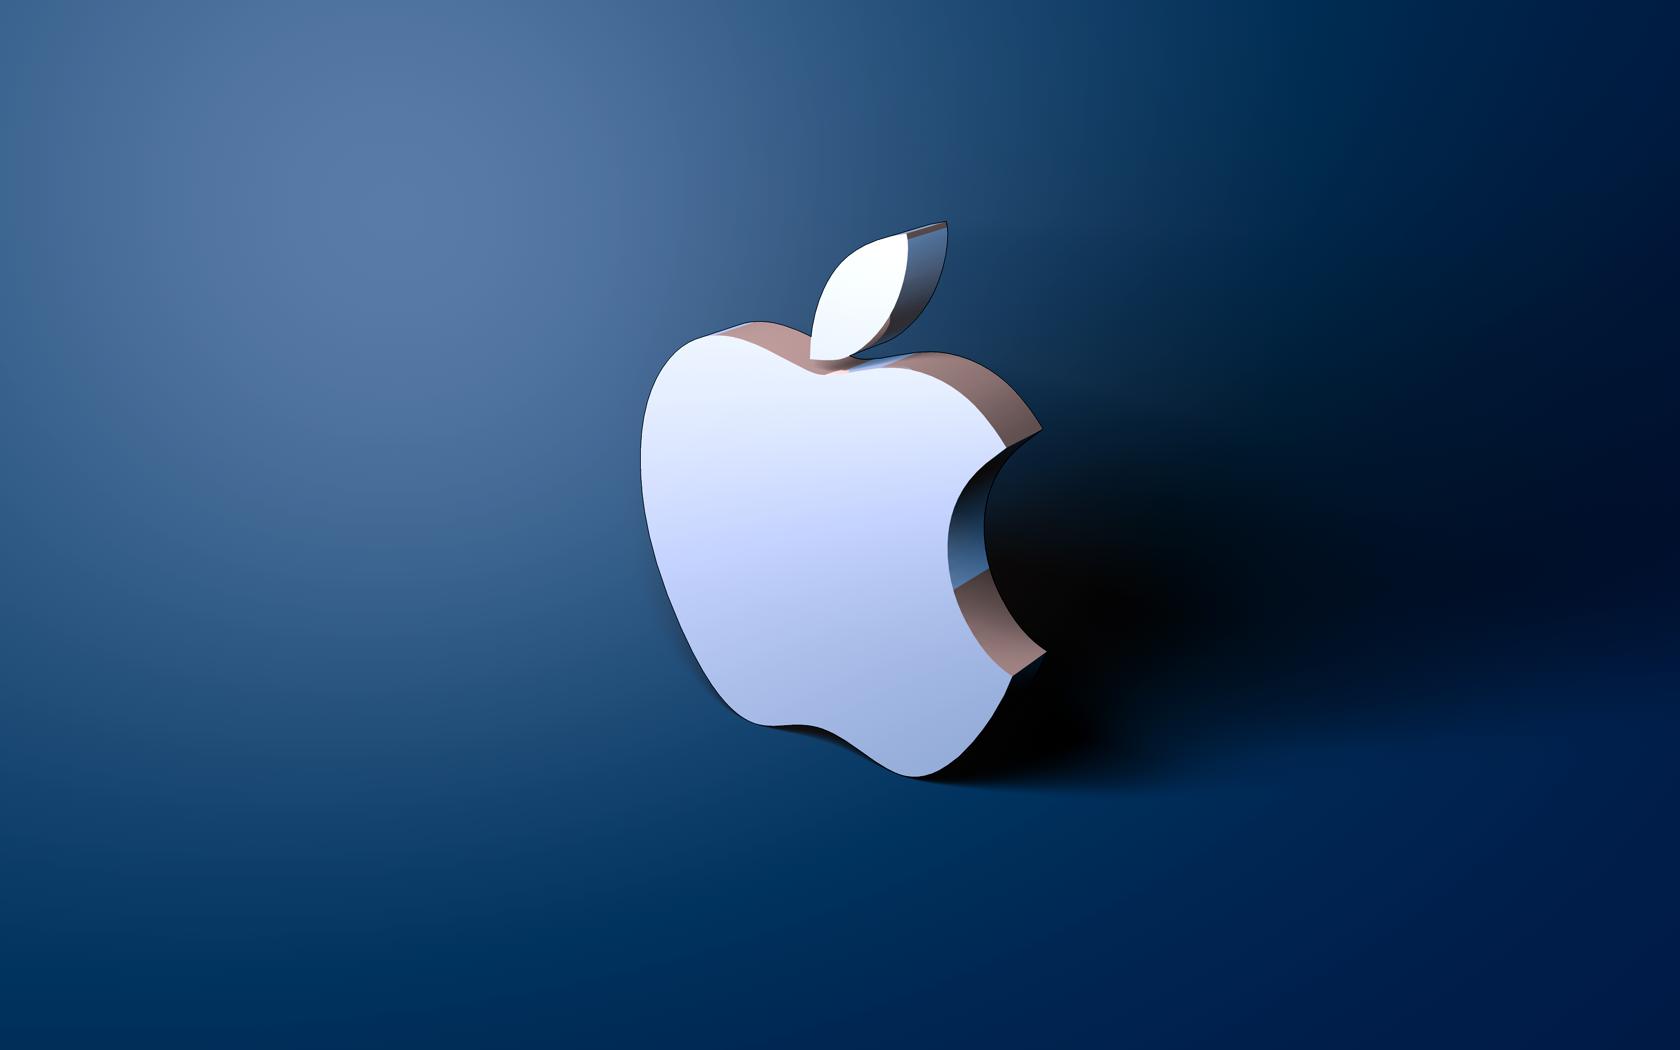 Apple glossy